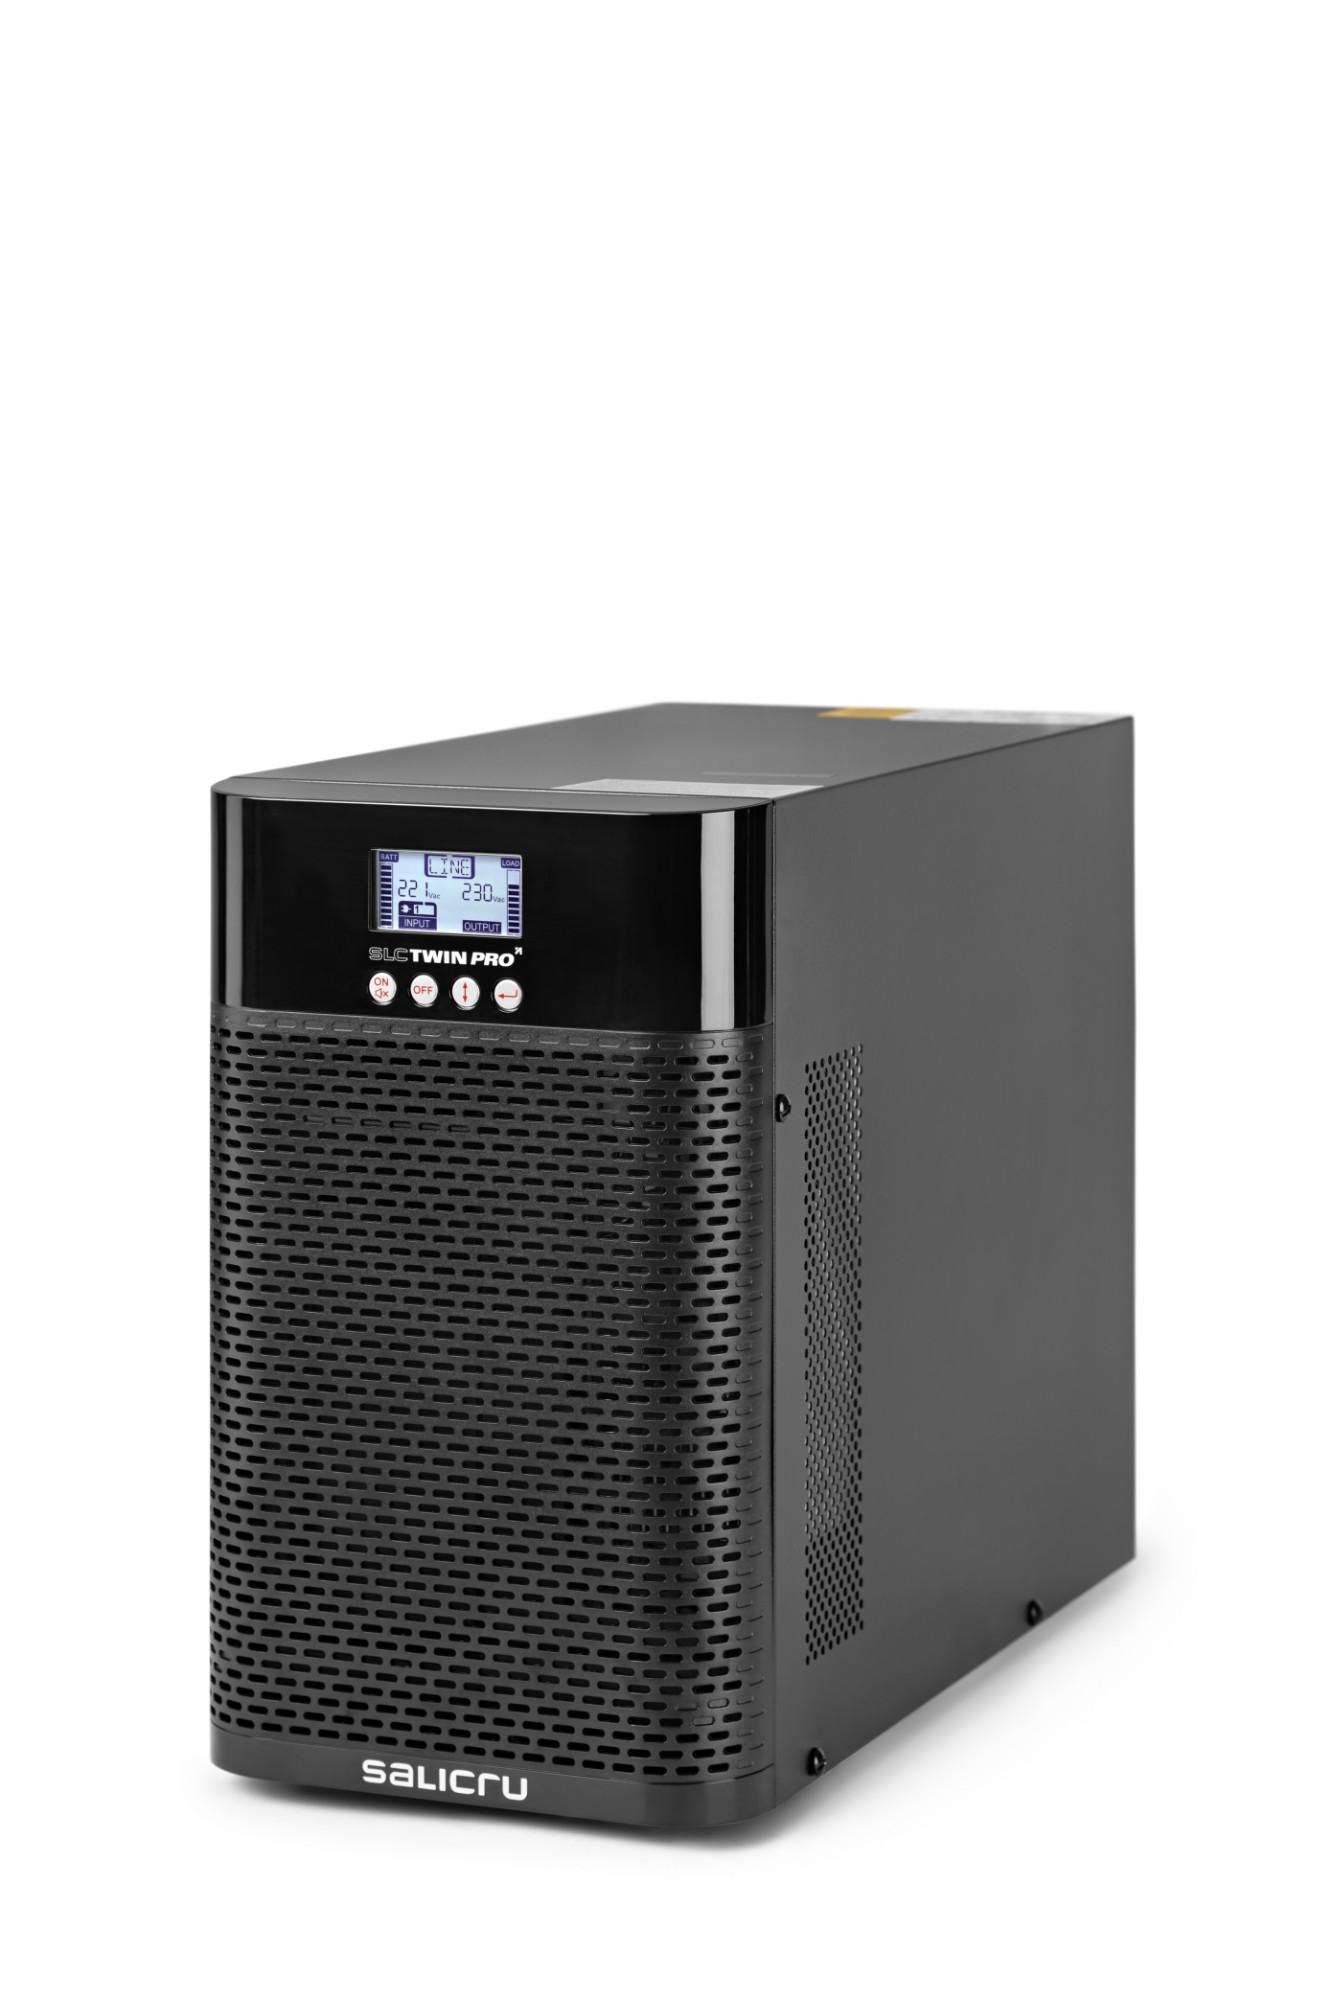 Salicru SLC 3000 TWIN PRO2 SAI On-line doble conversión de 700 VA a 3000 VA